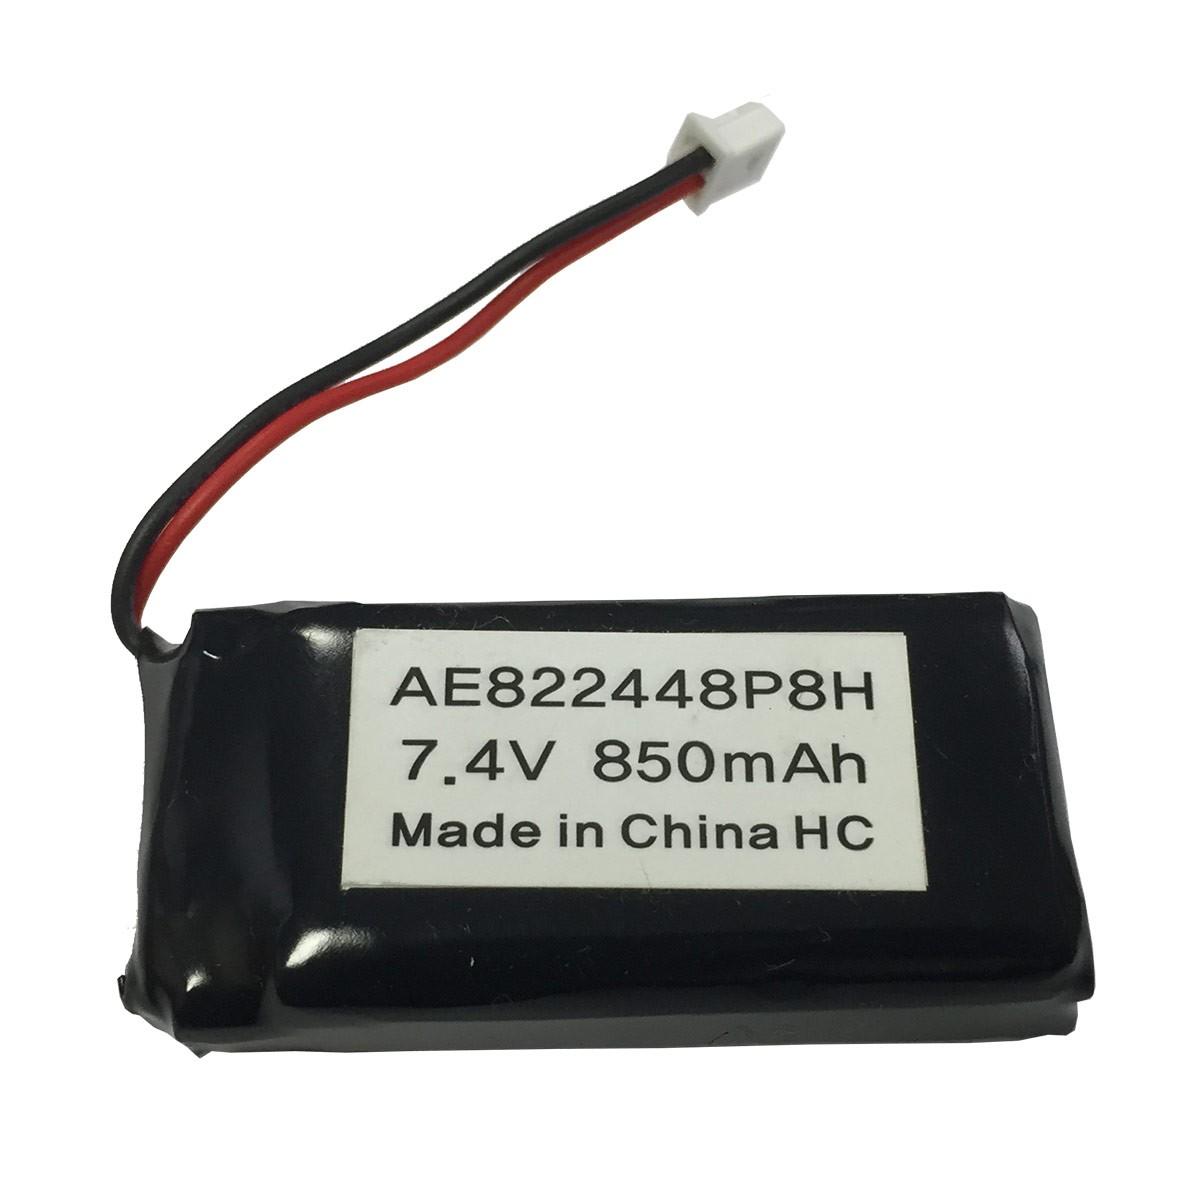 Dogtra Replacement Battery BP74TE